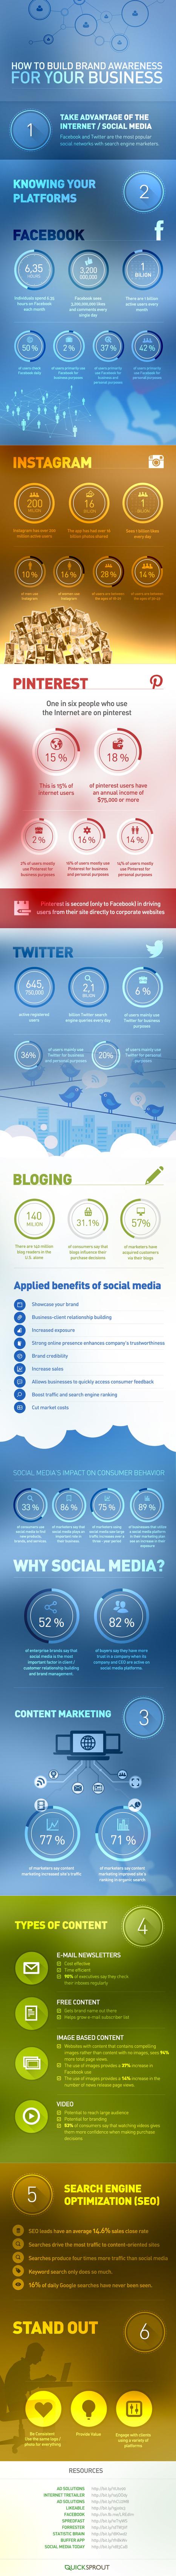 Facebook, Instagram, Pinterest, Twitter: How to Build Brand Awareness [INFOGRAPHIC] - AllTwitter   Brand Awareness   Scoop.it